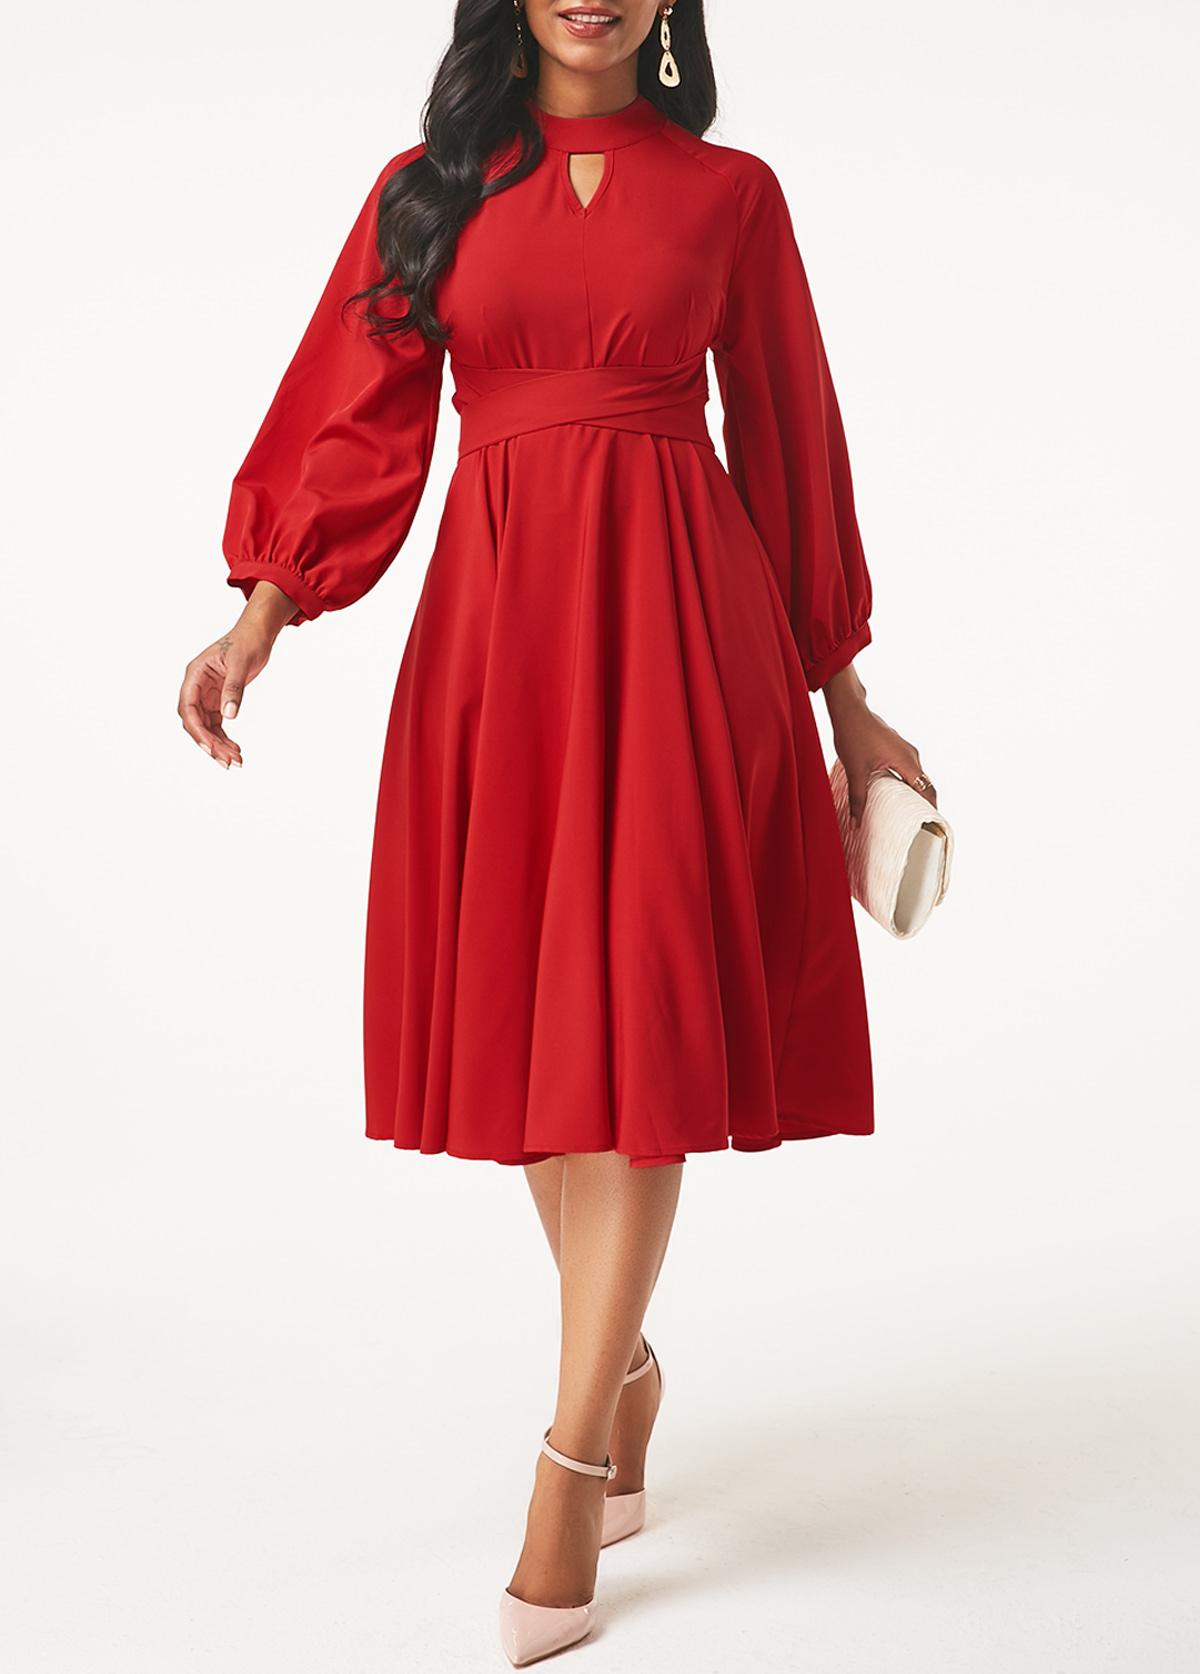 Lantern Sleeve Keyhole Neckline Red Dress